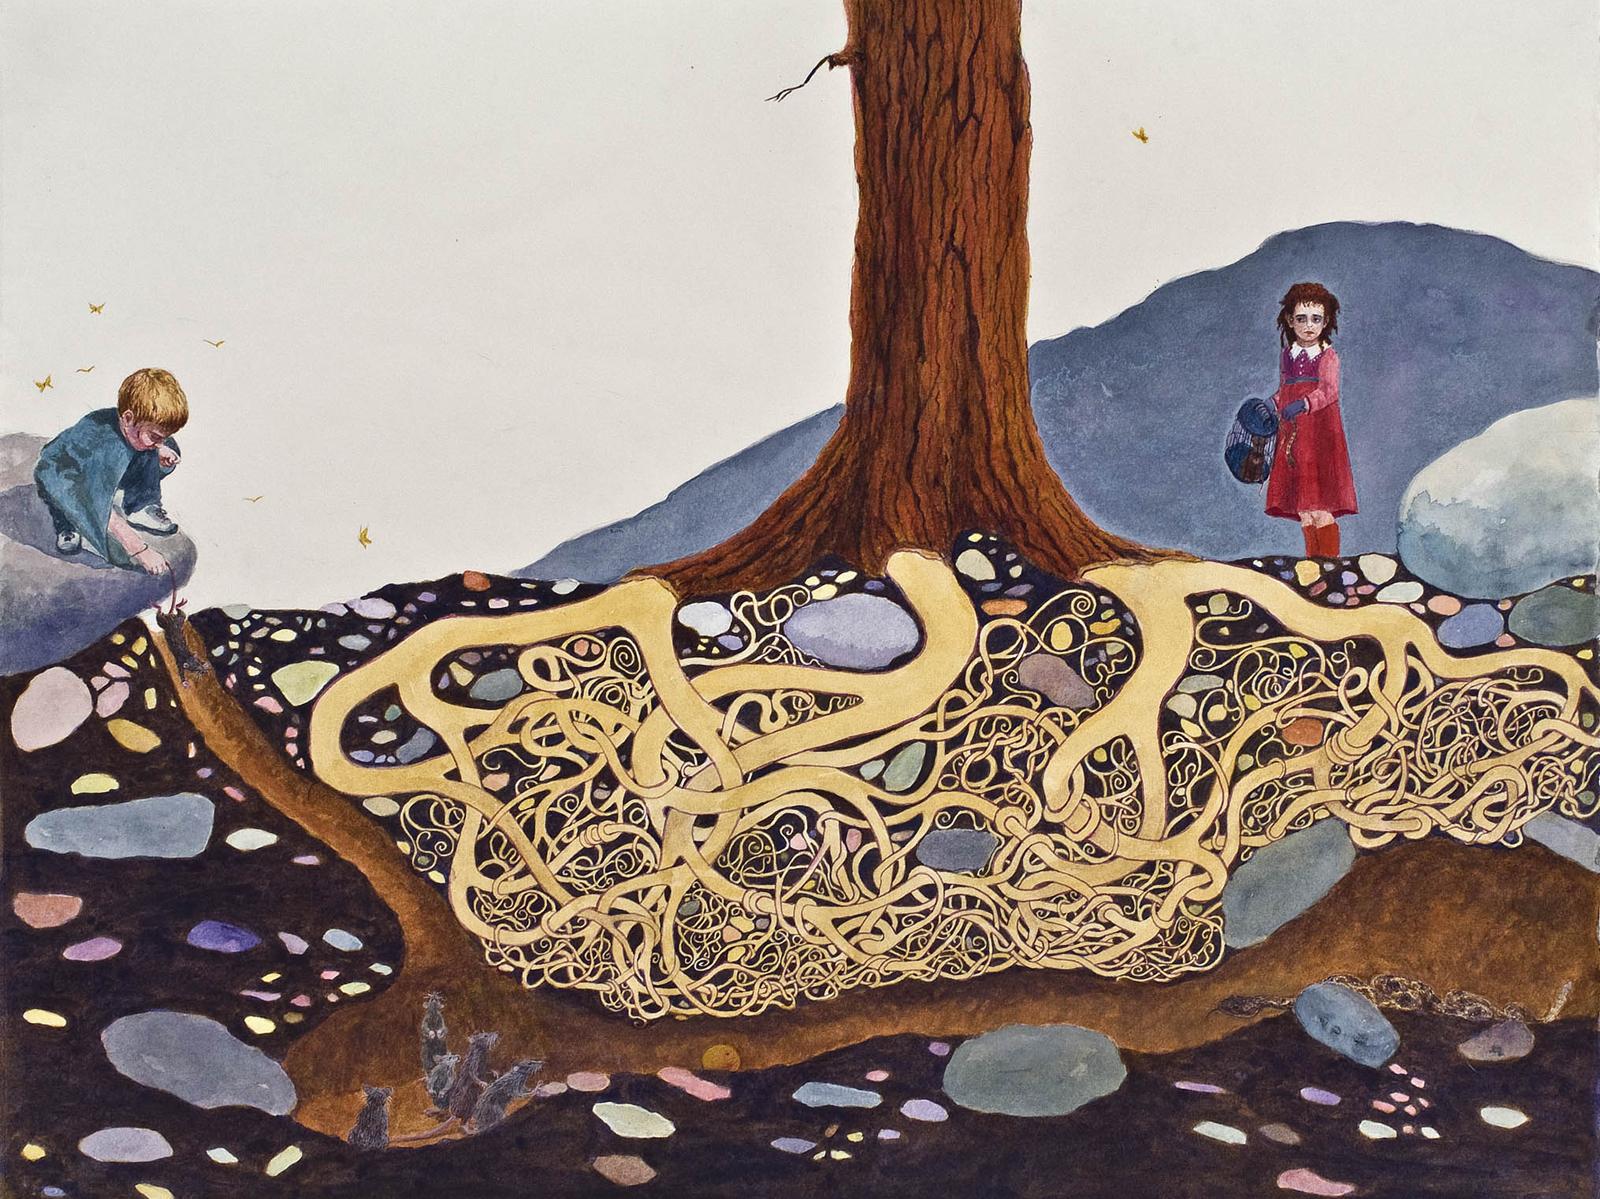 "Treasures, 17"" x 22.5"", watercolor & gouache, 2010"